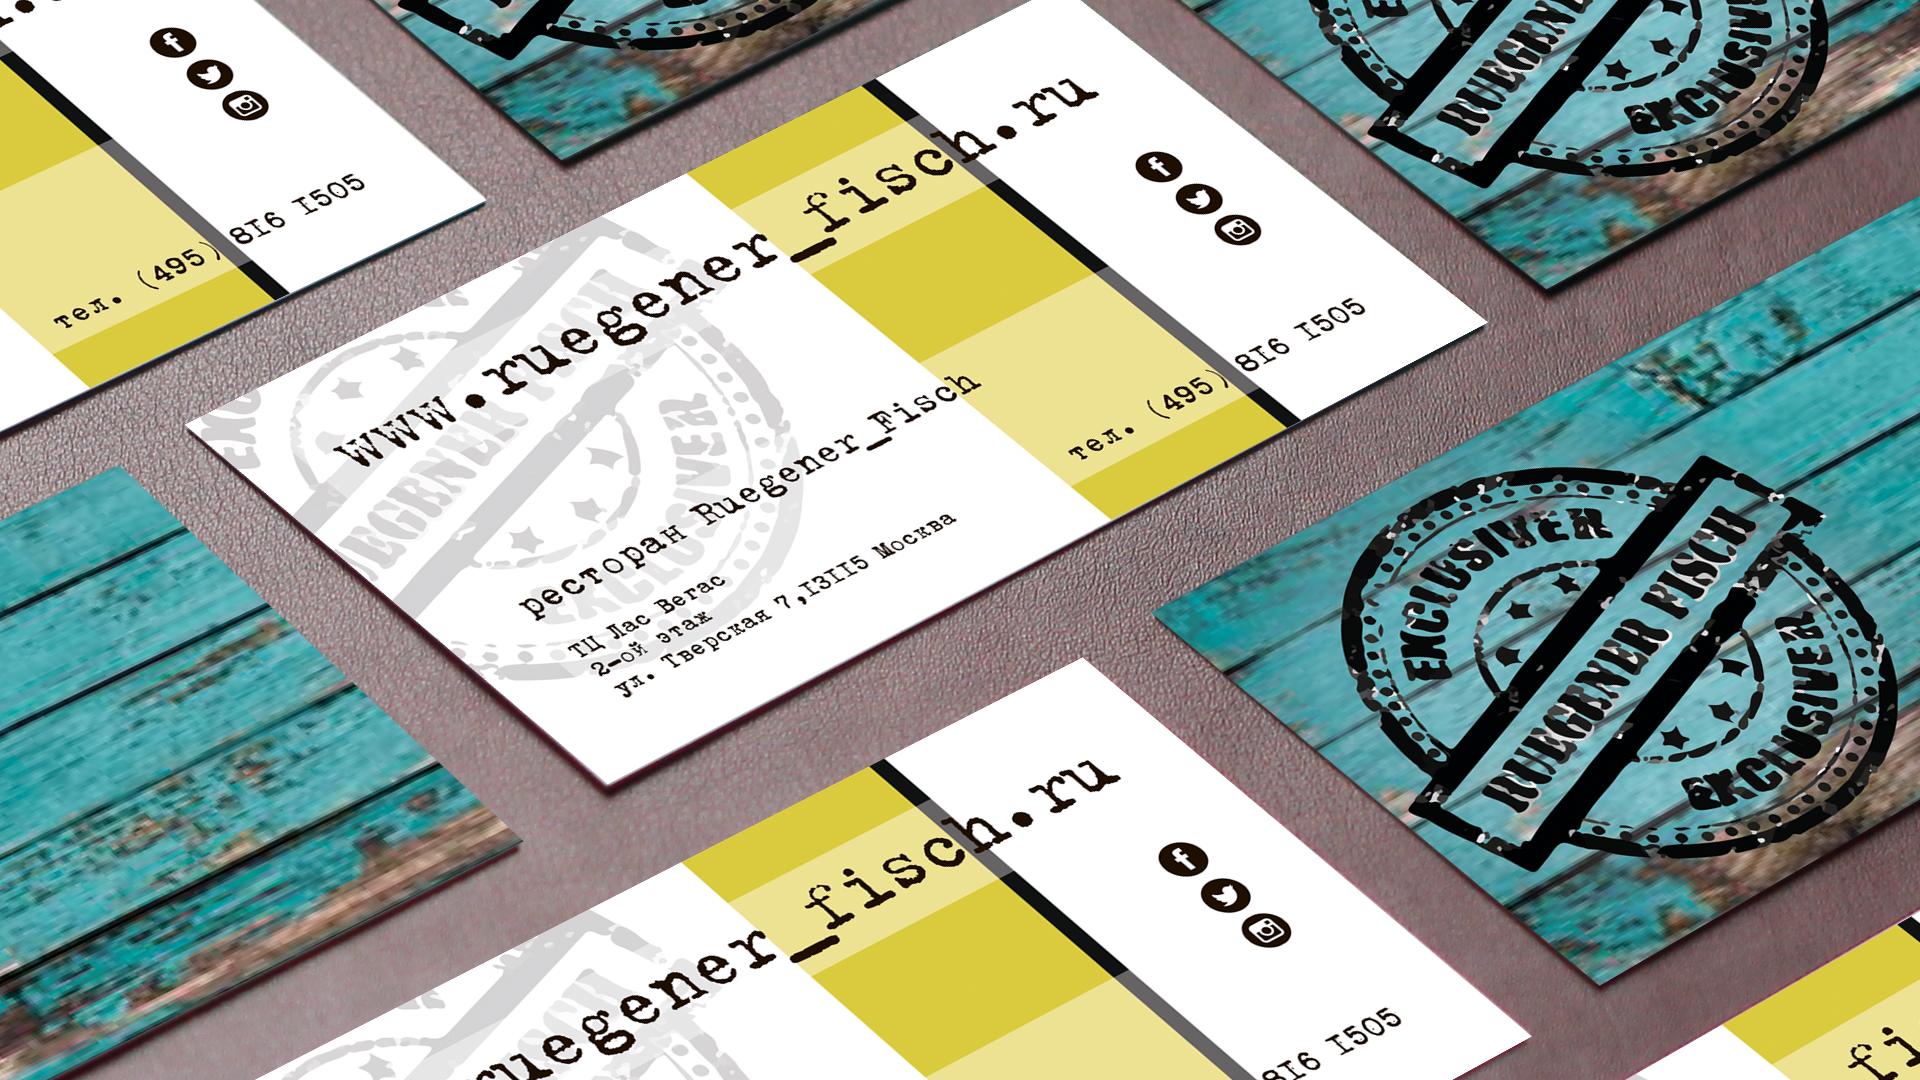 Angelina Dederer_Business cards pano